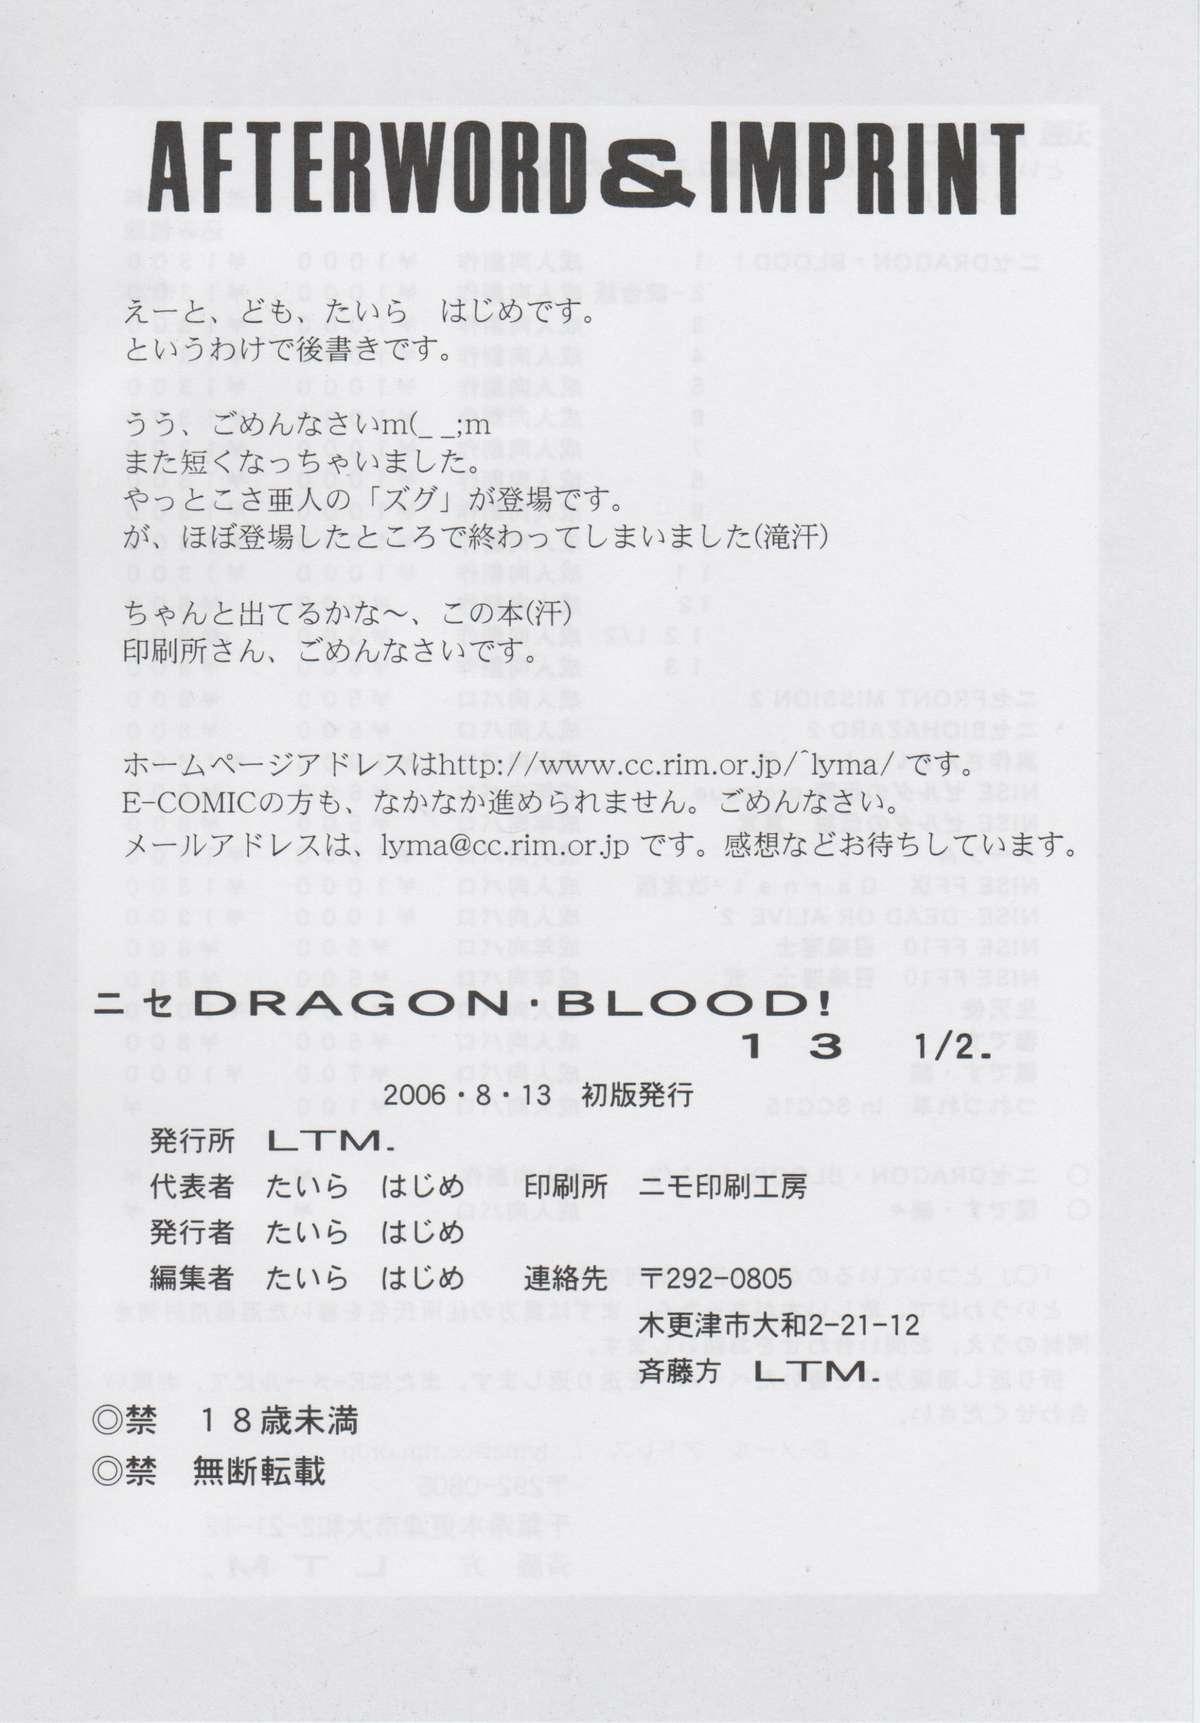 Nise Dragon Blood! 13 1/2 23